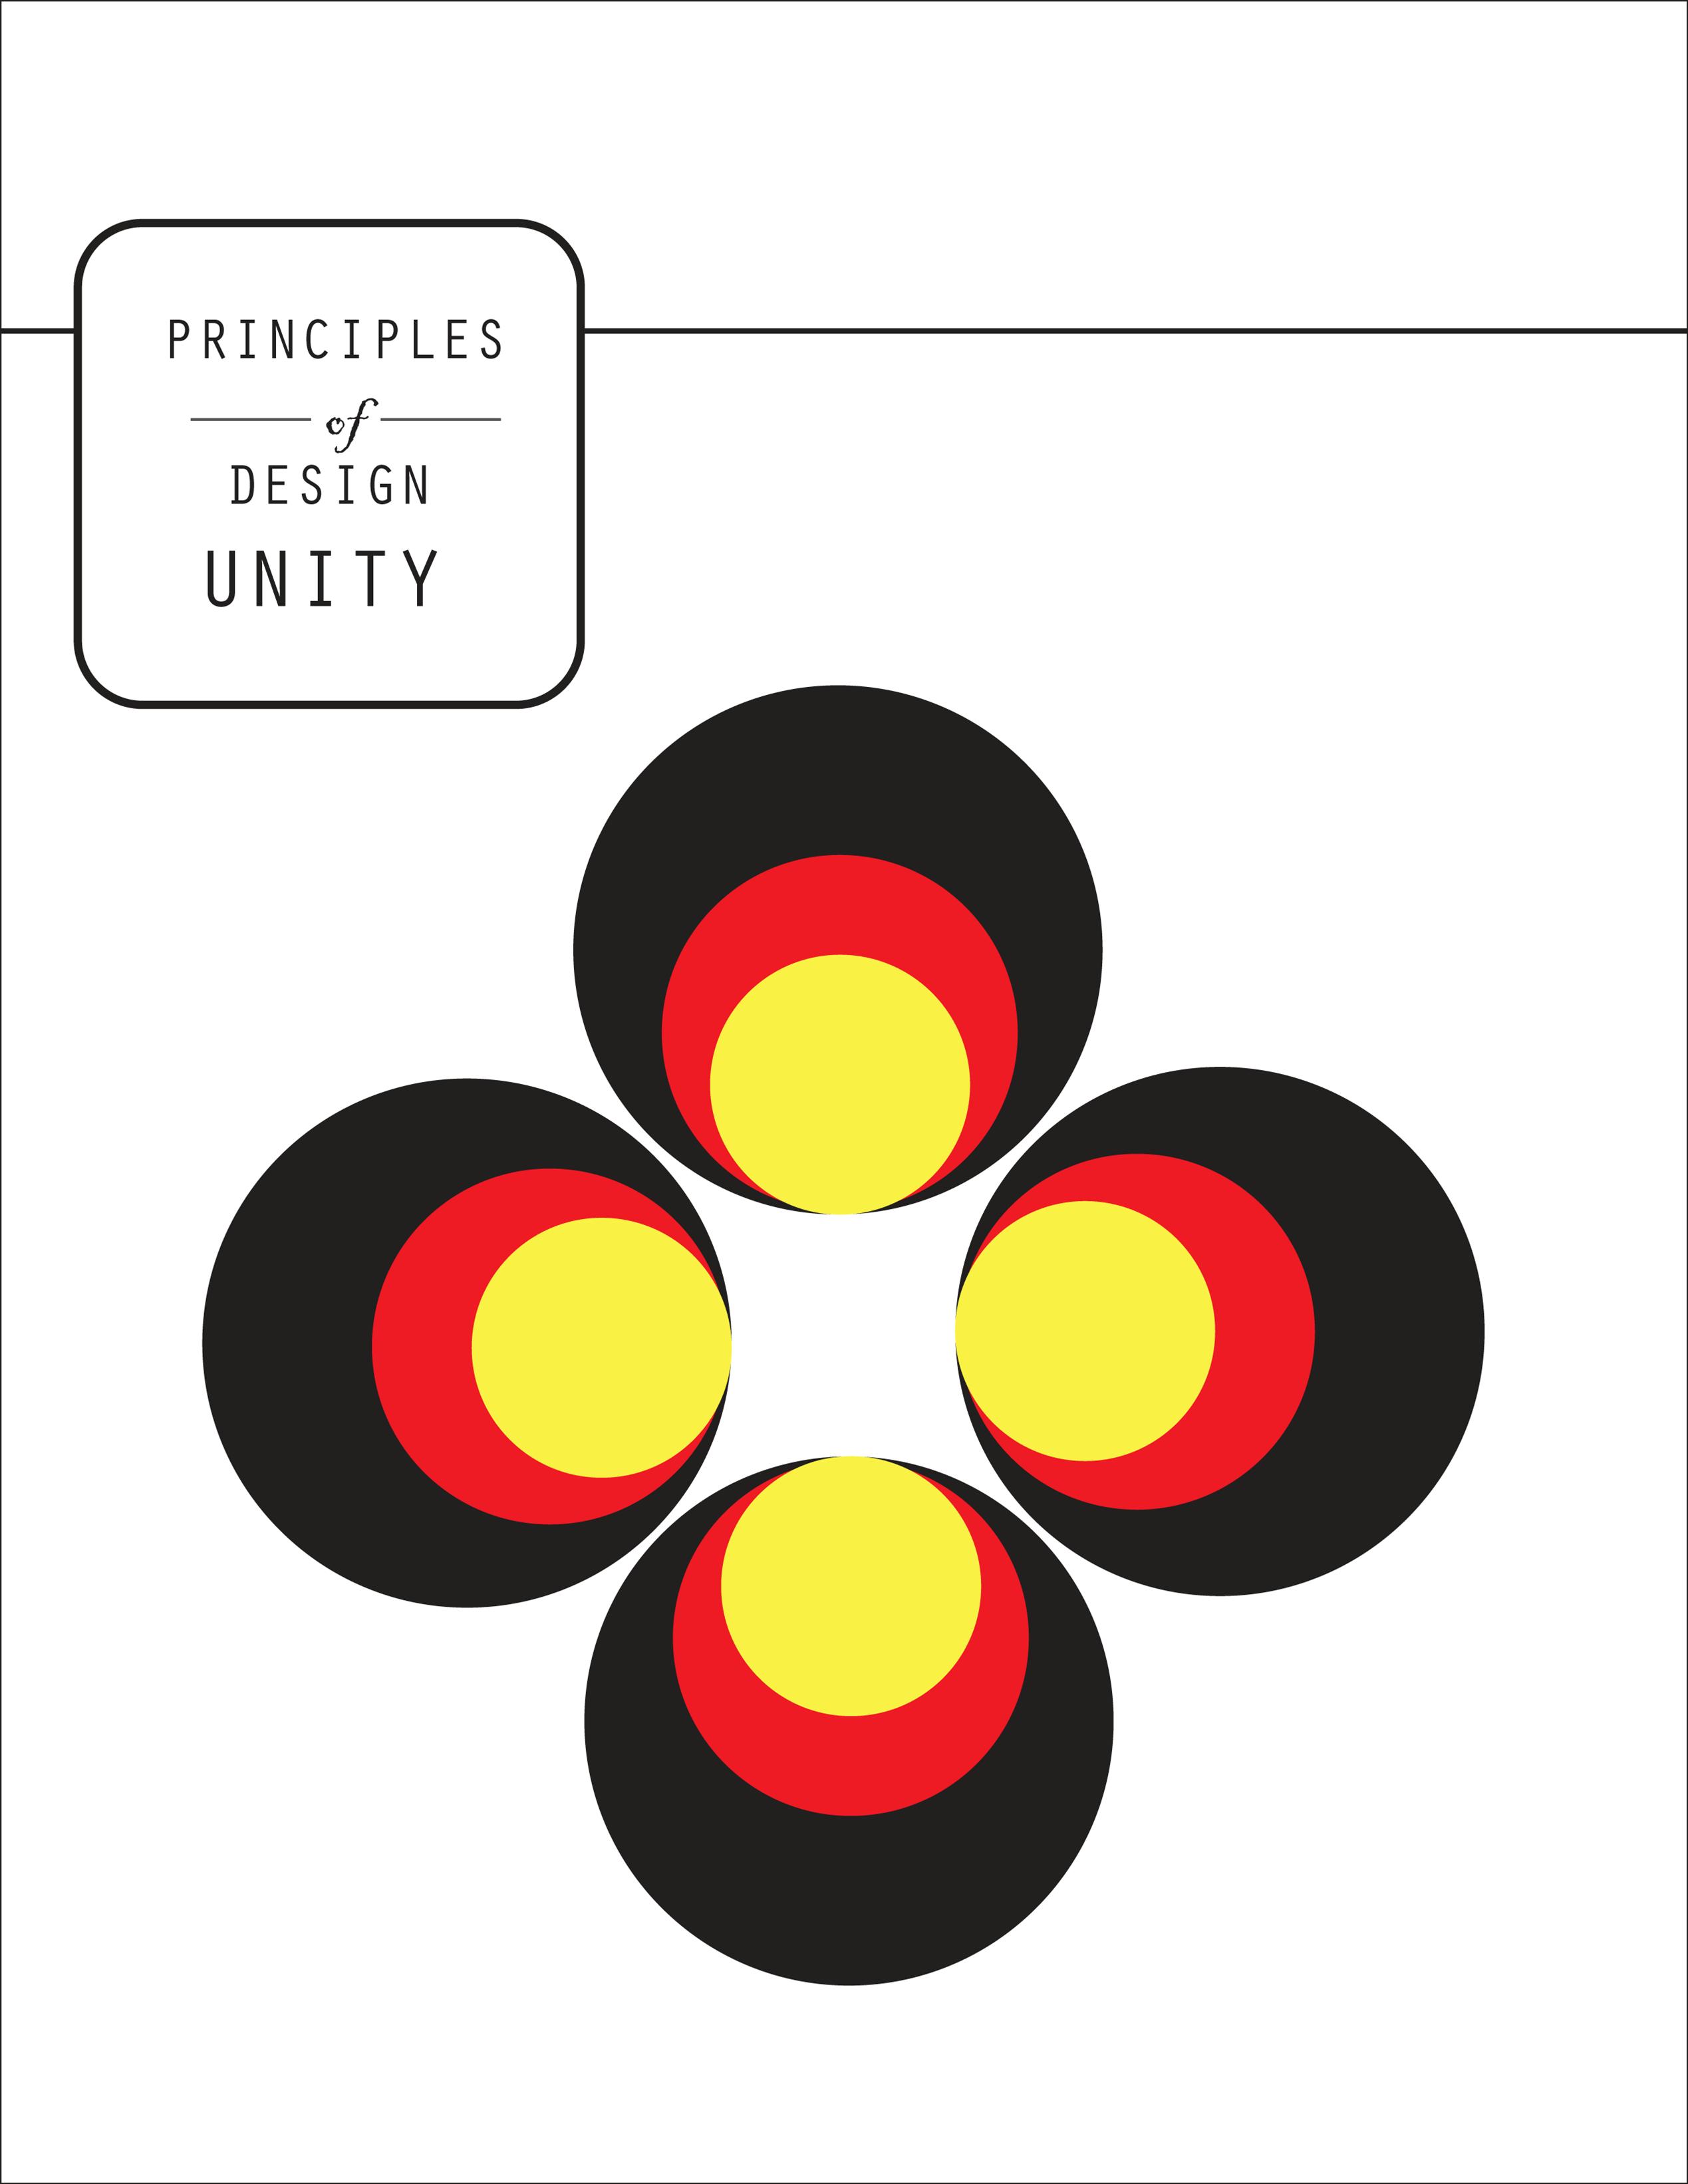 Principle of Design Unity